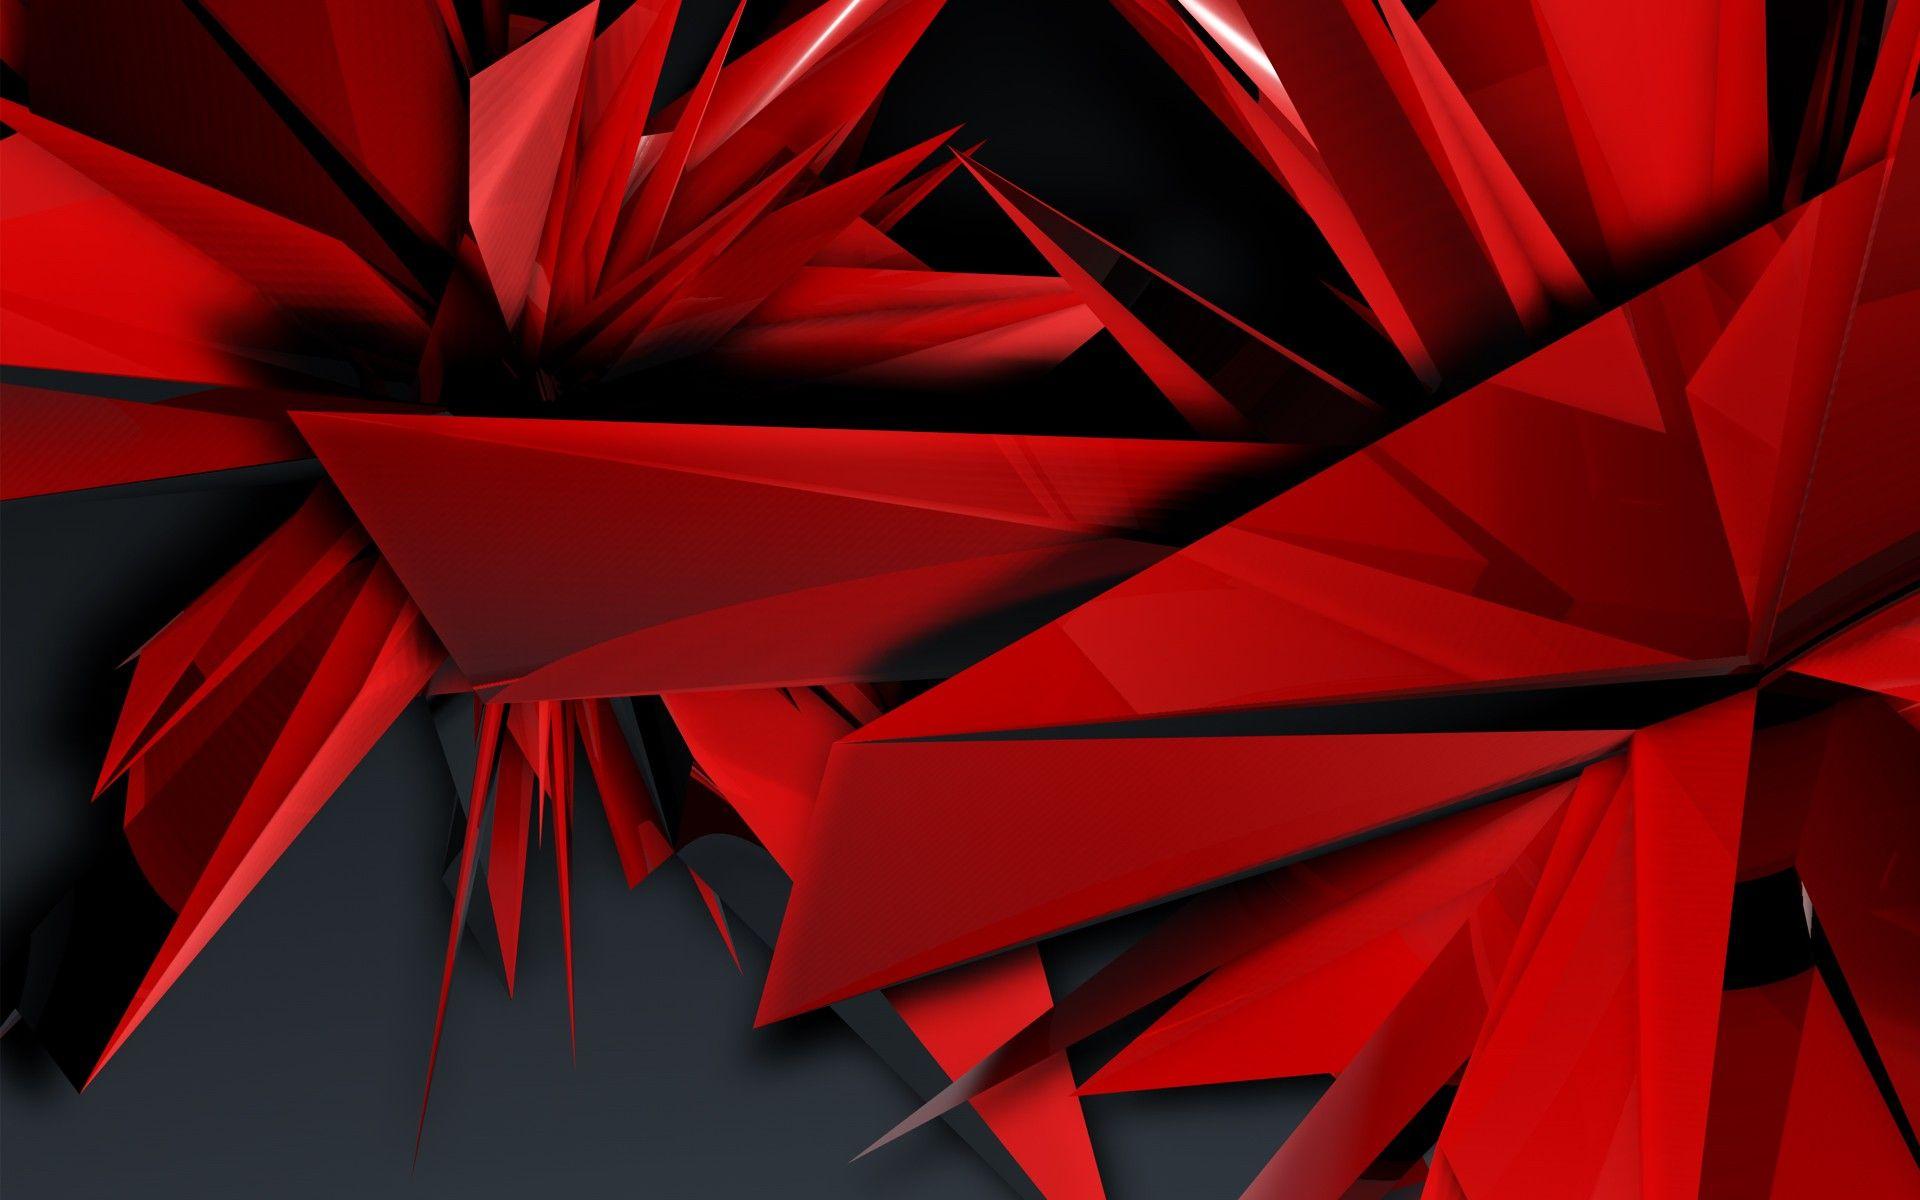 Fantastic Abstract Red Artwork Hd Wallpaper Picture For Pc Desktop Abstract Abstract Wallpaper Red Artwork